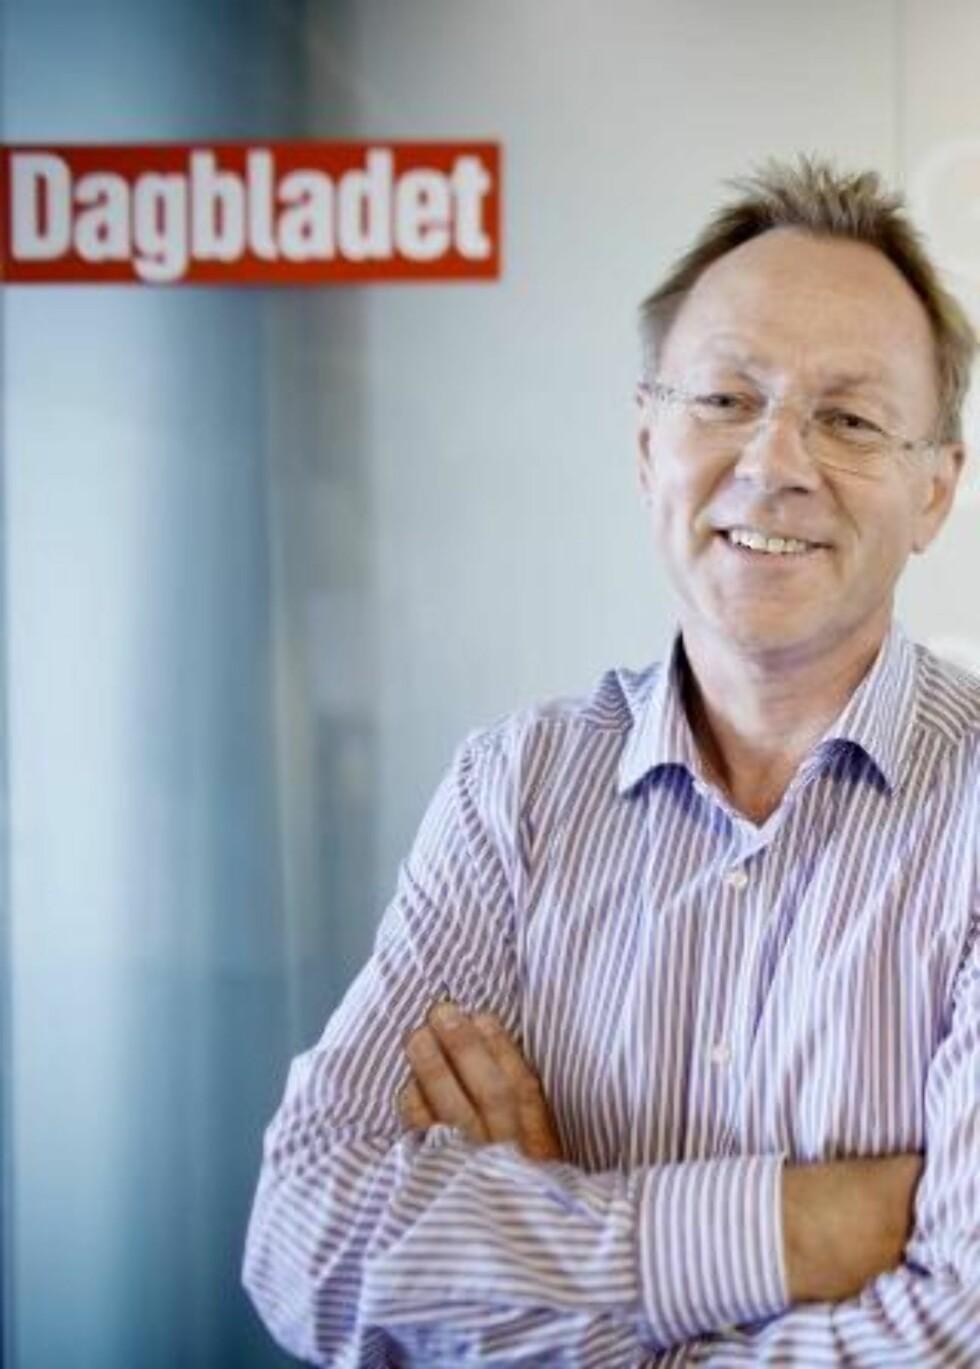 OGSÅ FORNØYD: Konserndirektør i Berner Gruppen, John Arne Markussen, er fornøyd med resultatet. Foto: ESPEN RØST/Dagbladet